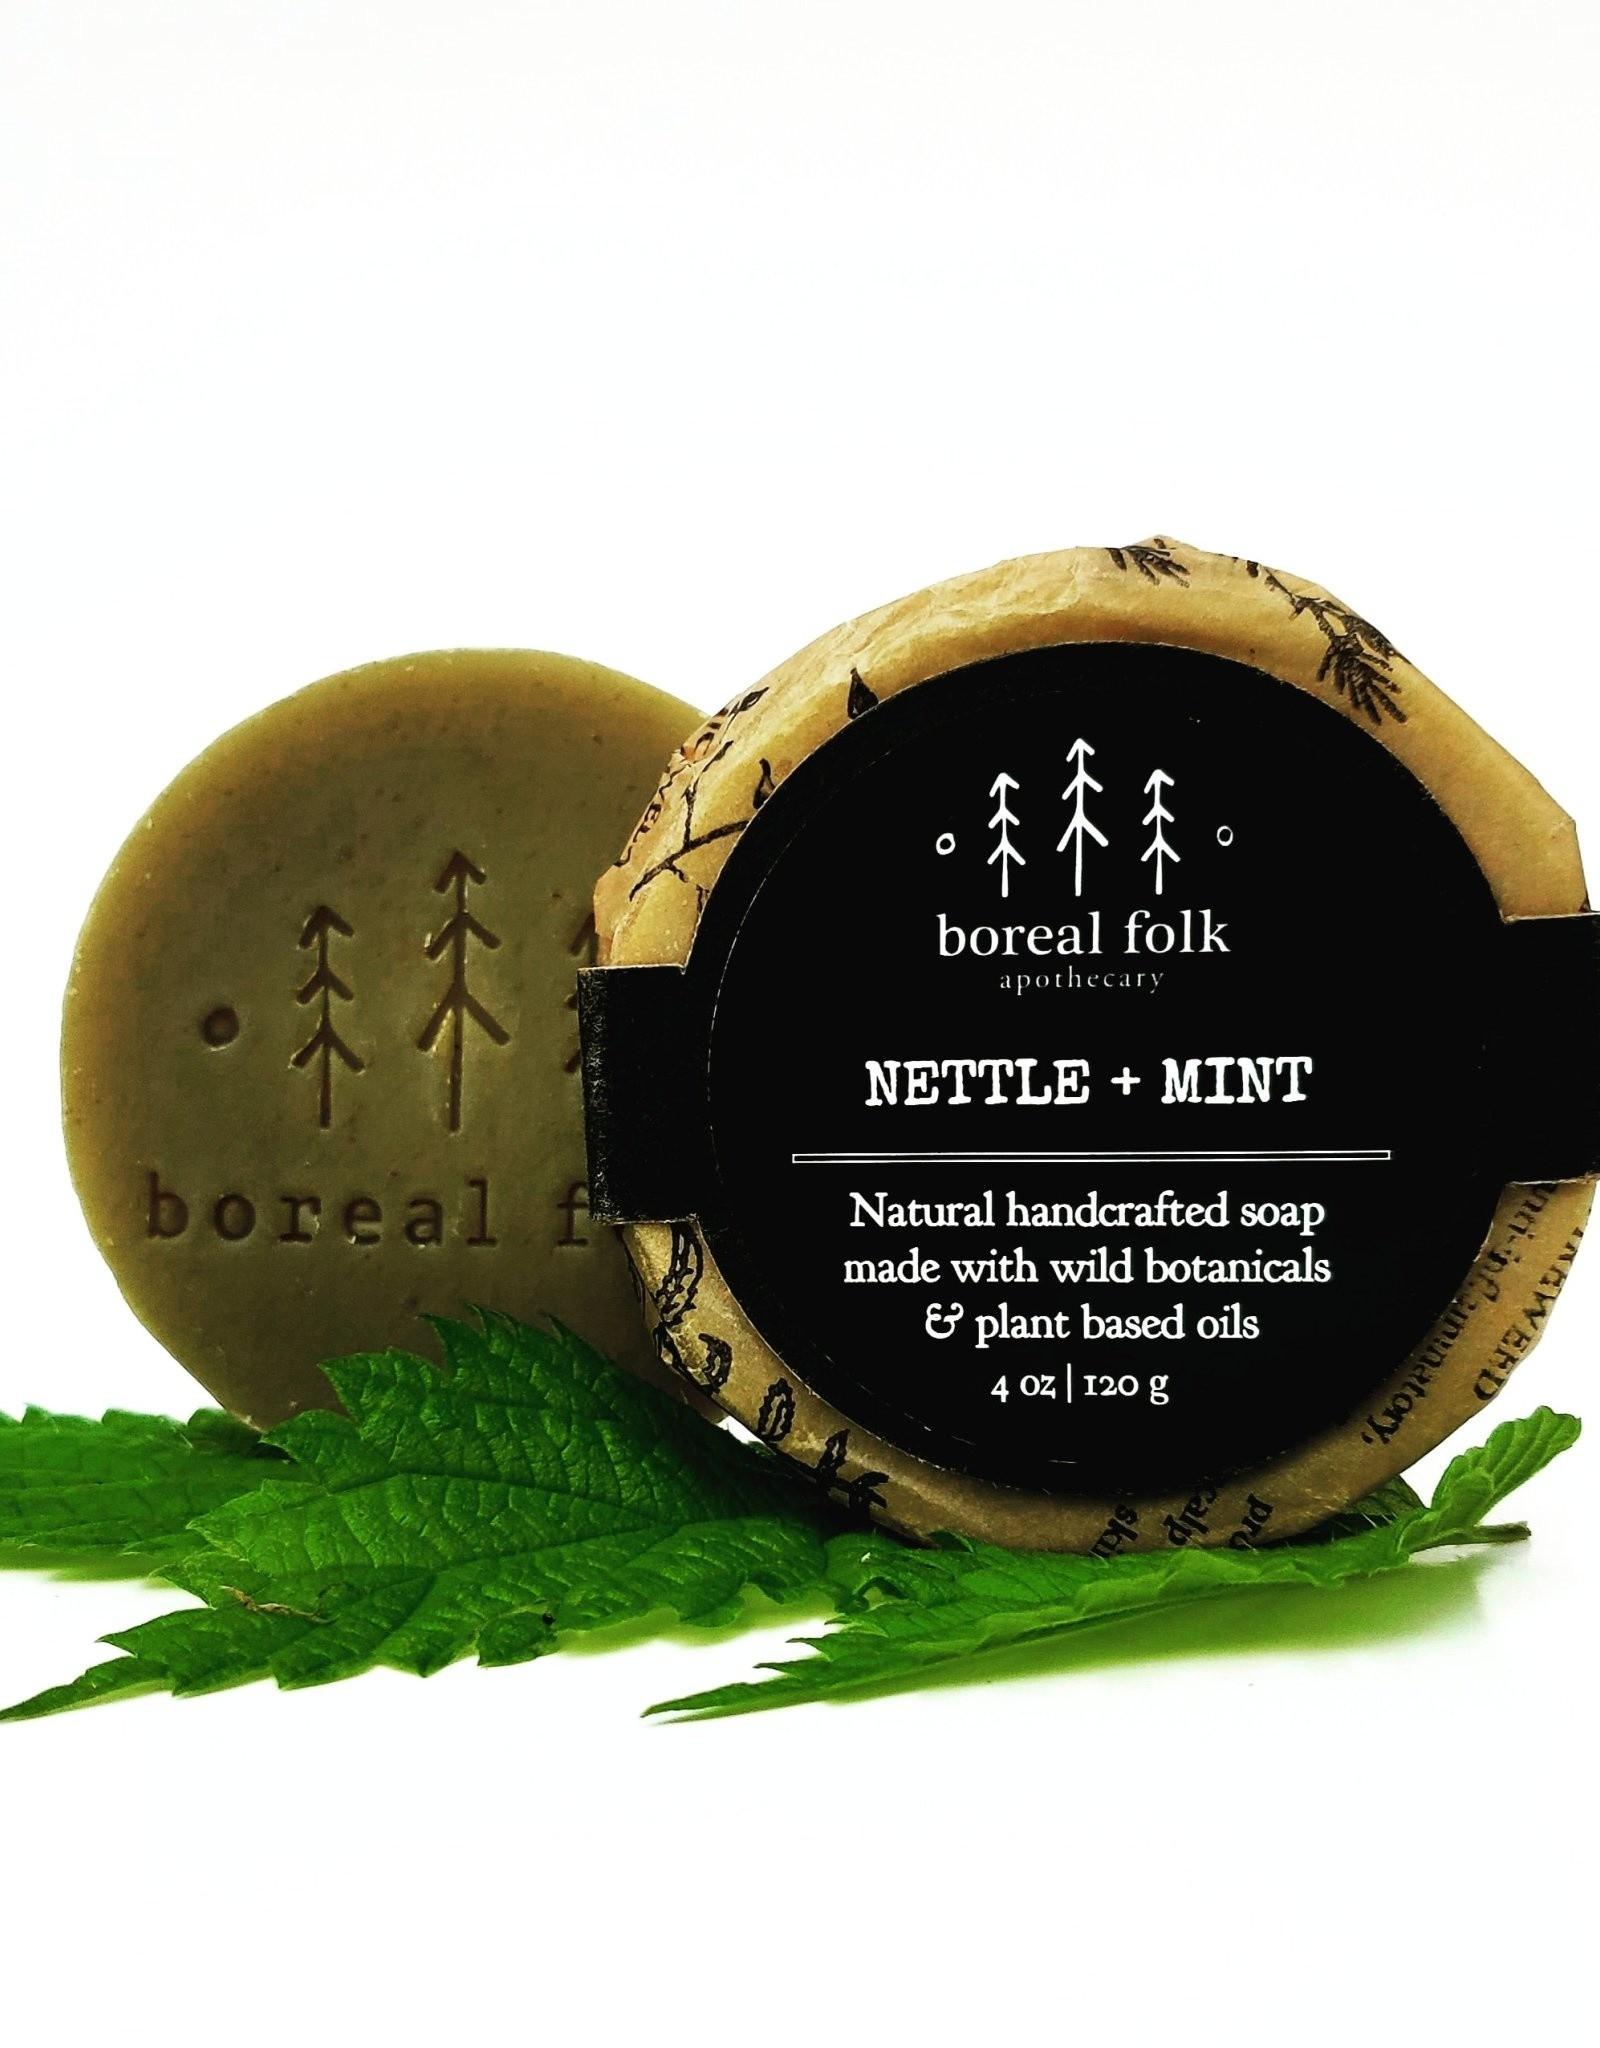 Boreal, Nettle & Mint soap